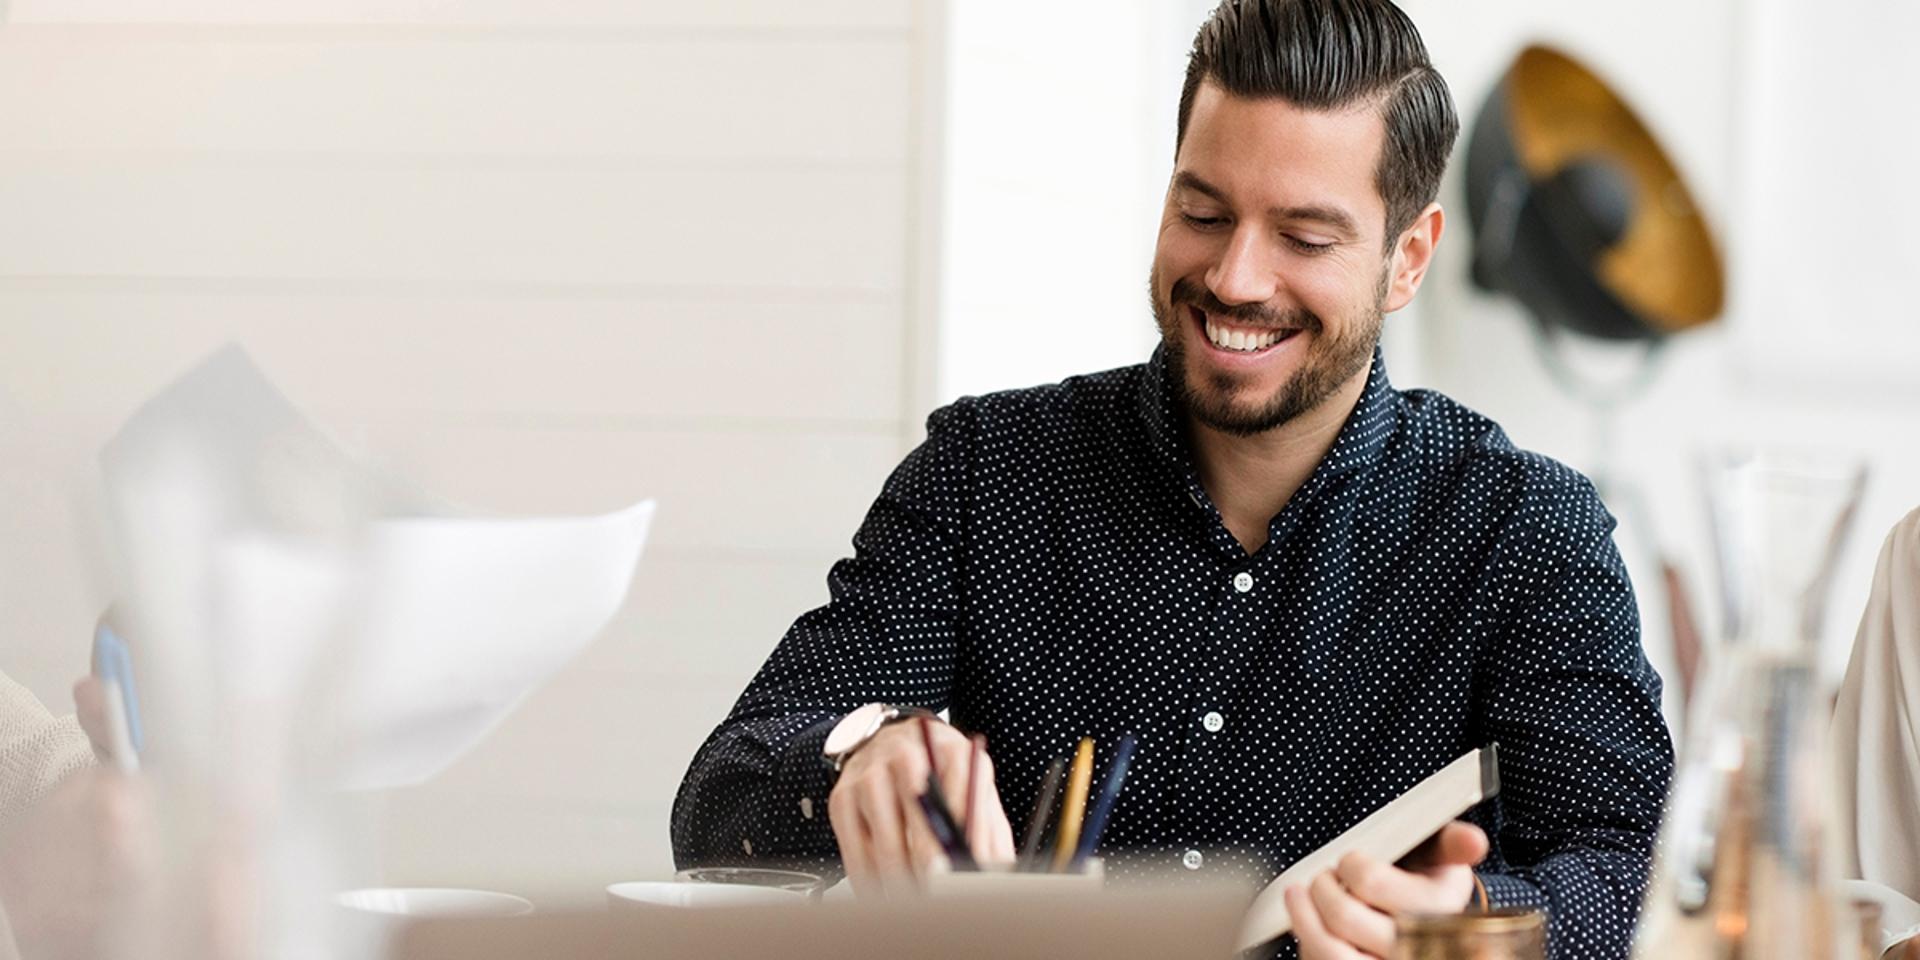 Digital rekrutteringsproces